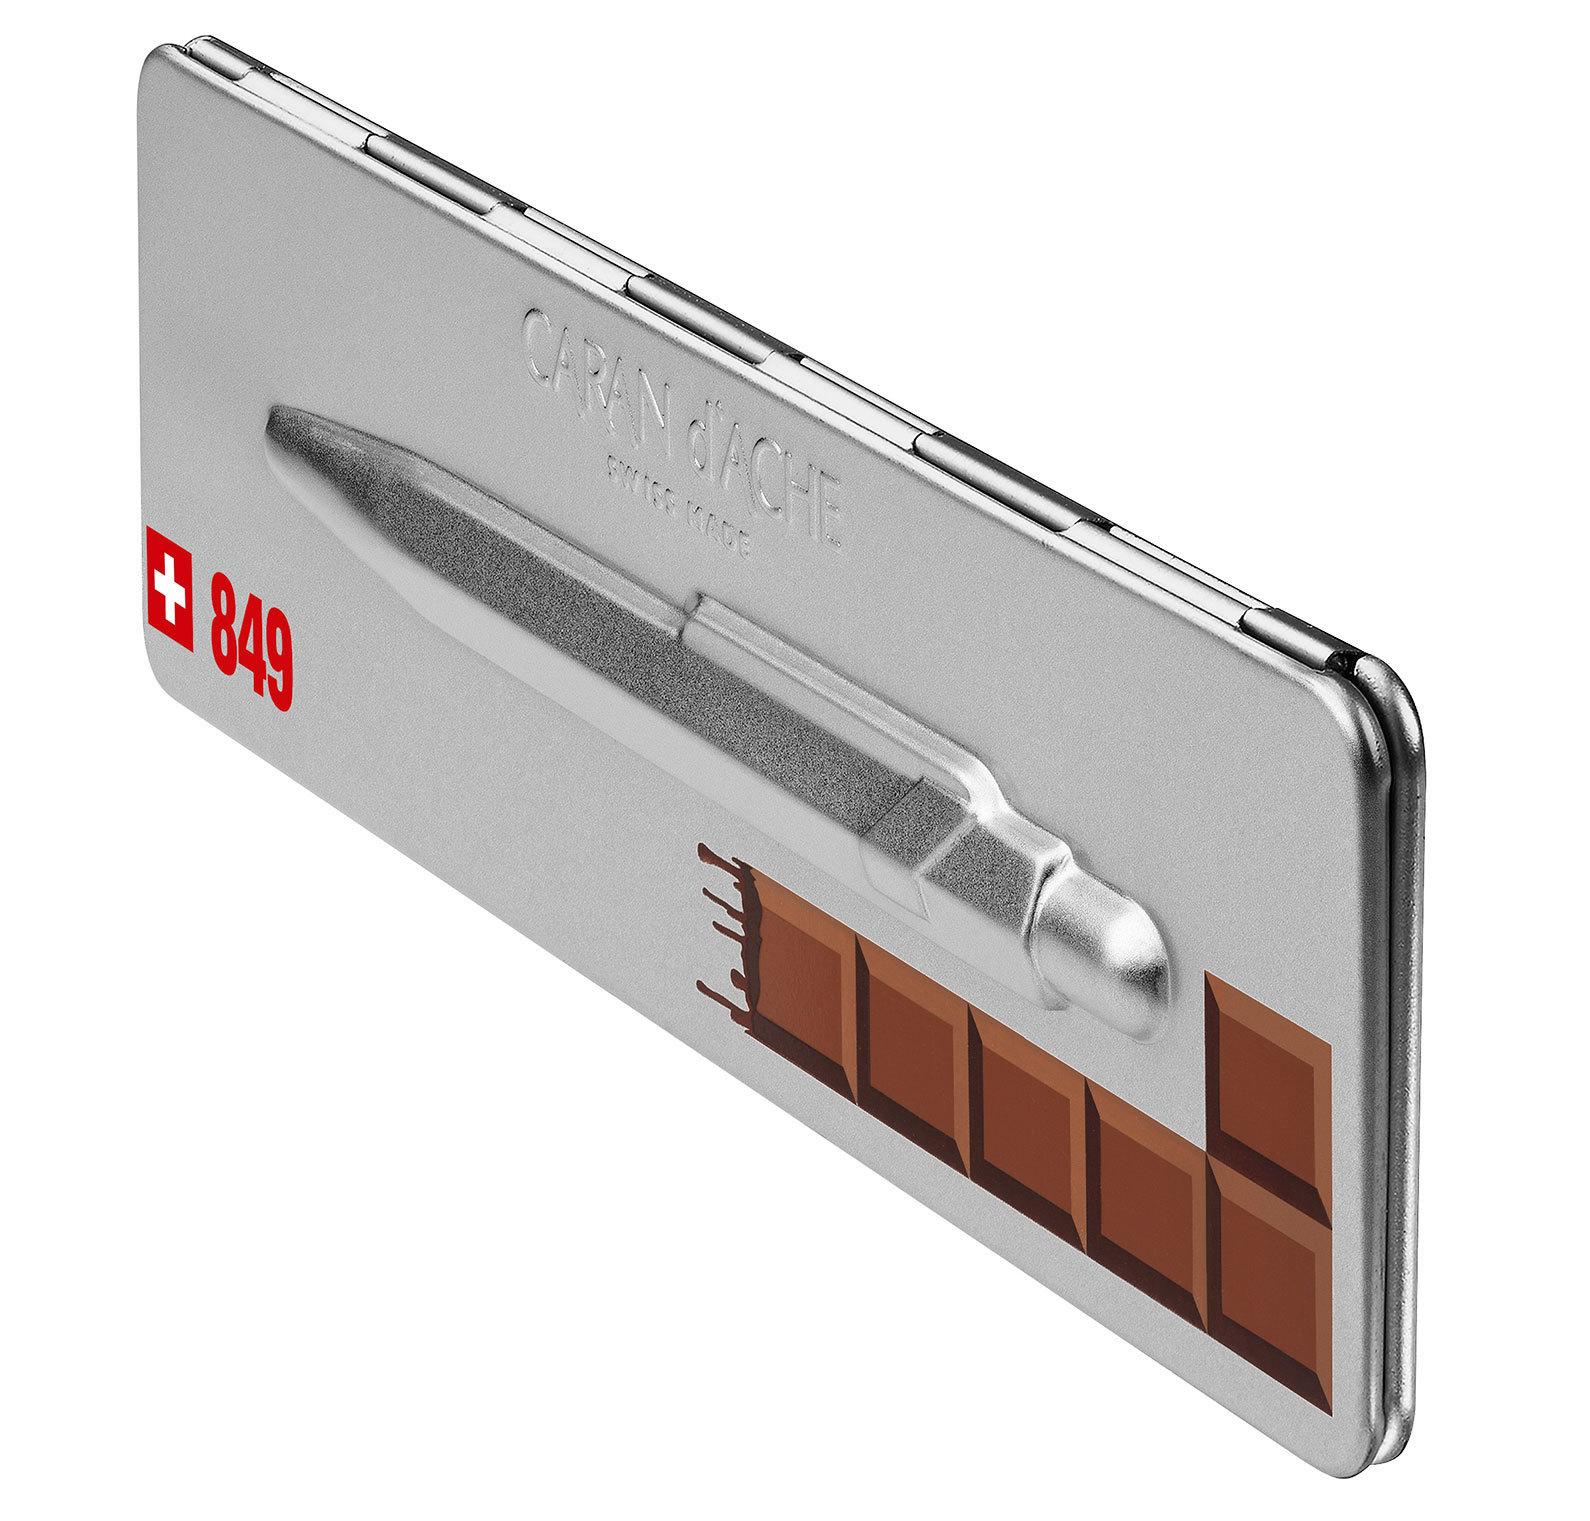 Шариковая ручка - Carandache Office 849 M